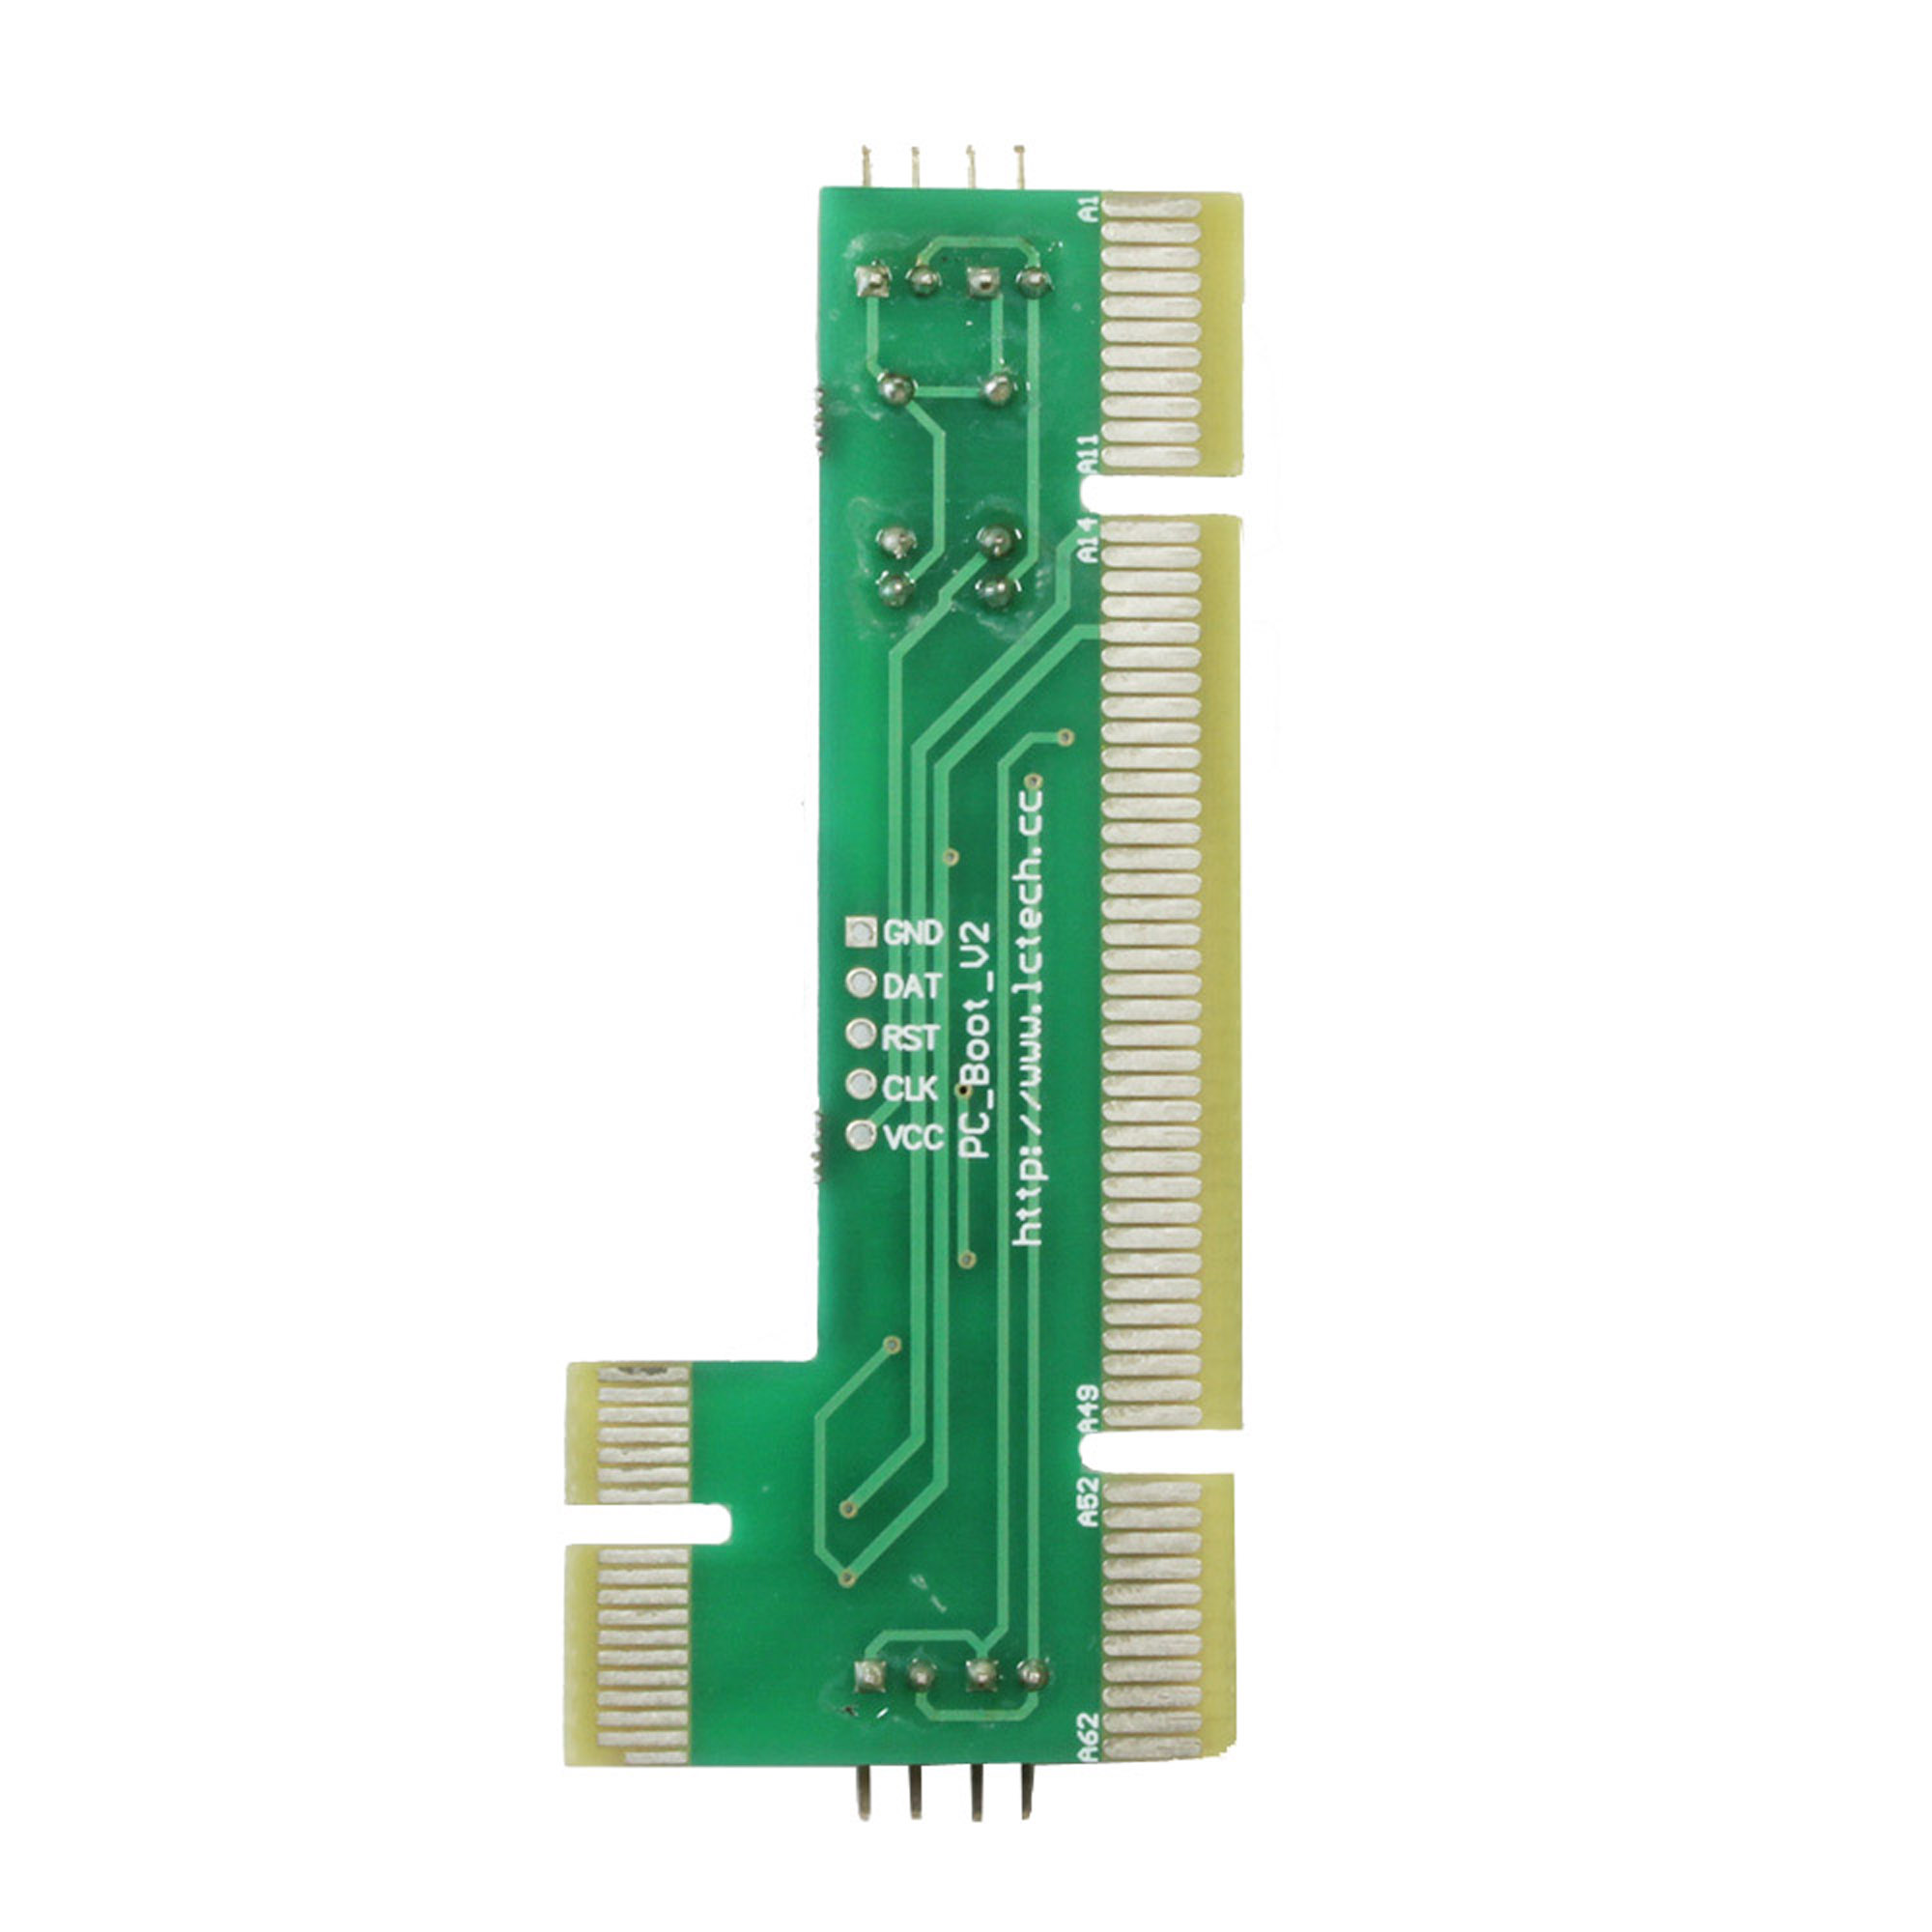 Dell CS24-SC PCIe Riser Board Card DAS48BTH4A0 Server Right Angle Replacement